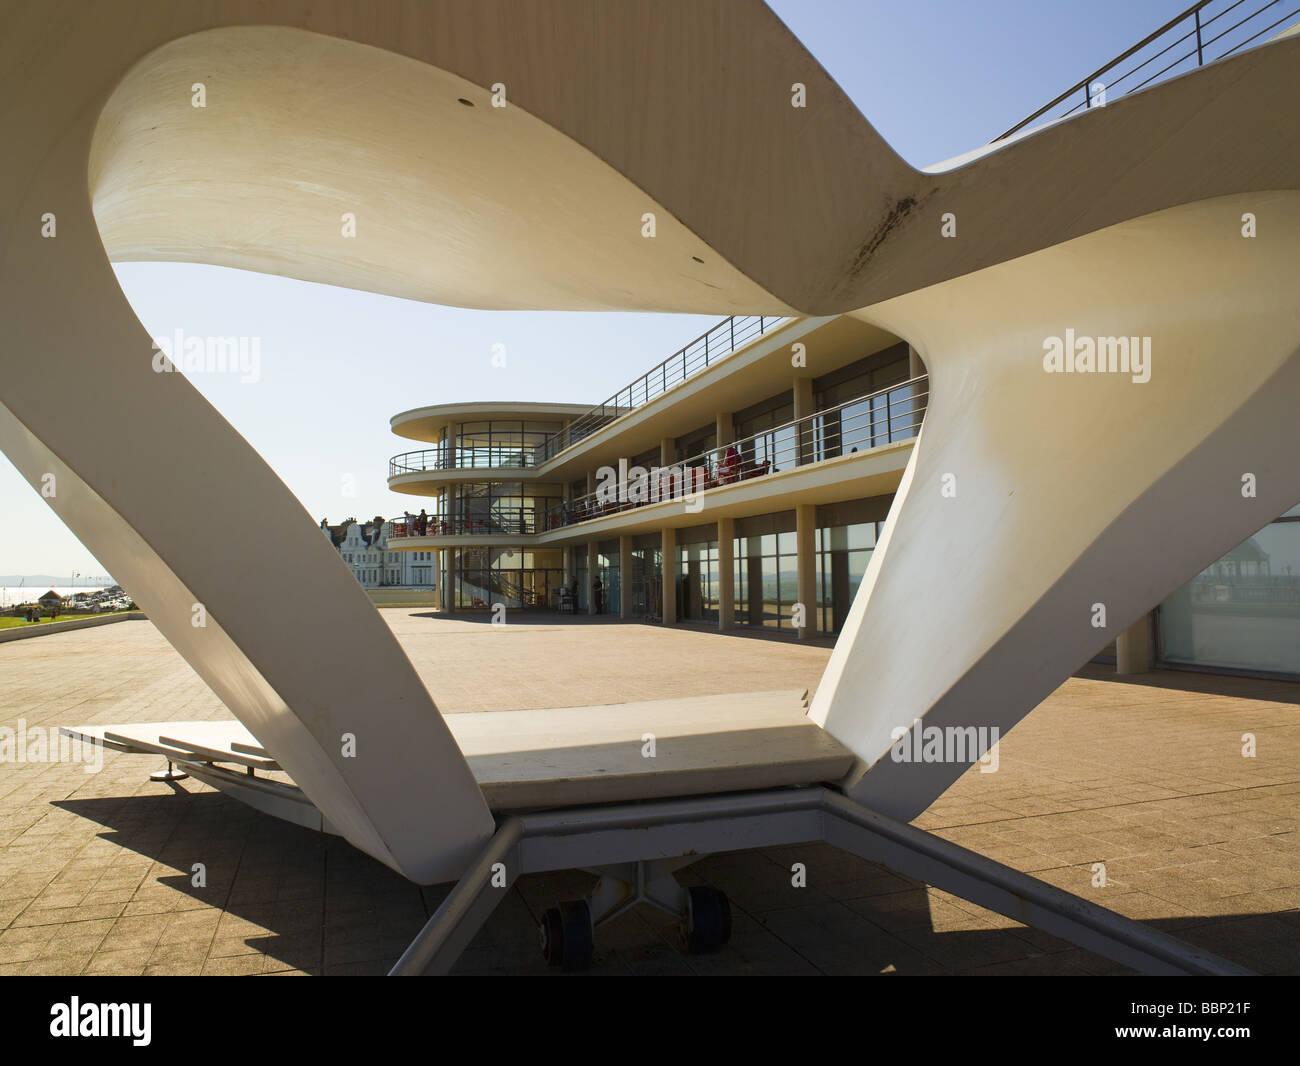 De la Warr Pavilion Bexhill on Sea  Mendelssohn & Chermayeff bandstand McLaughlin 2001 - Stock Image